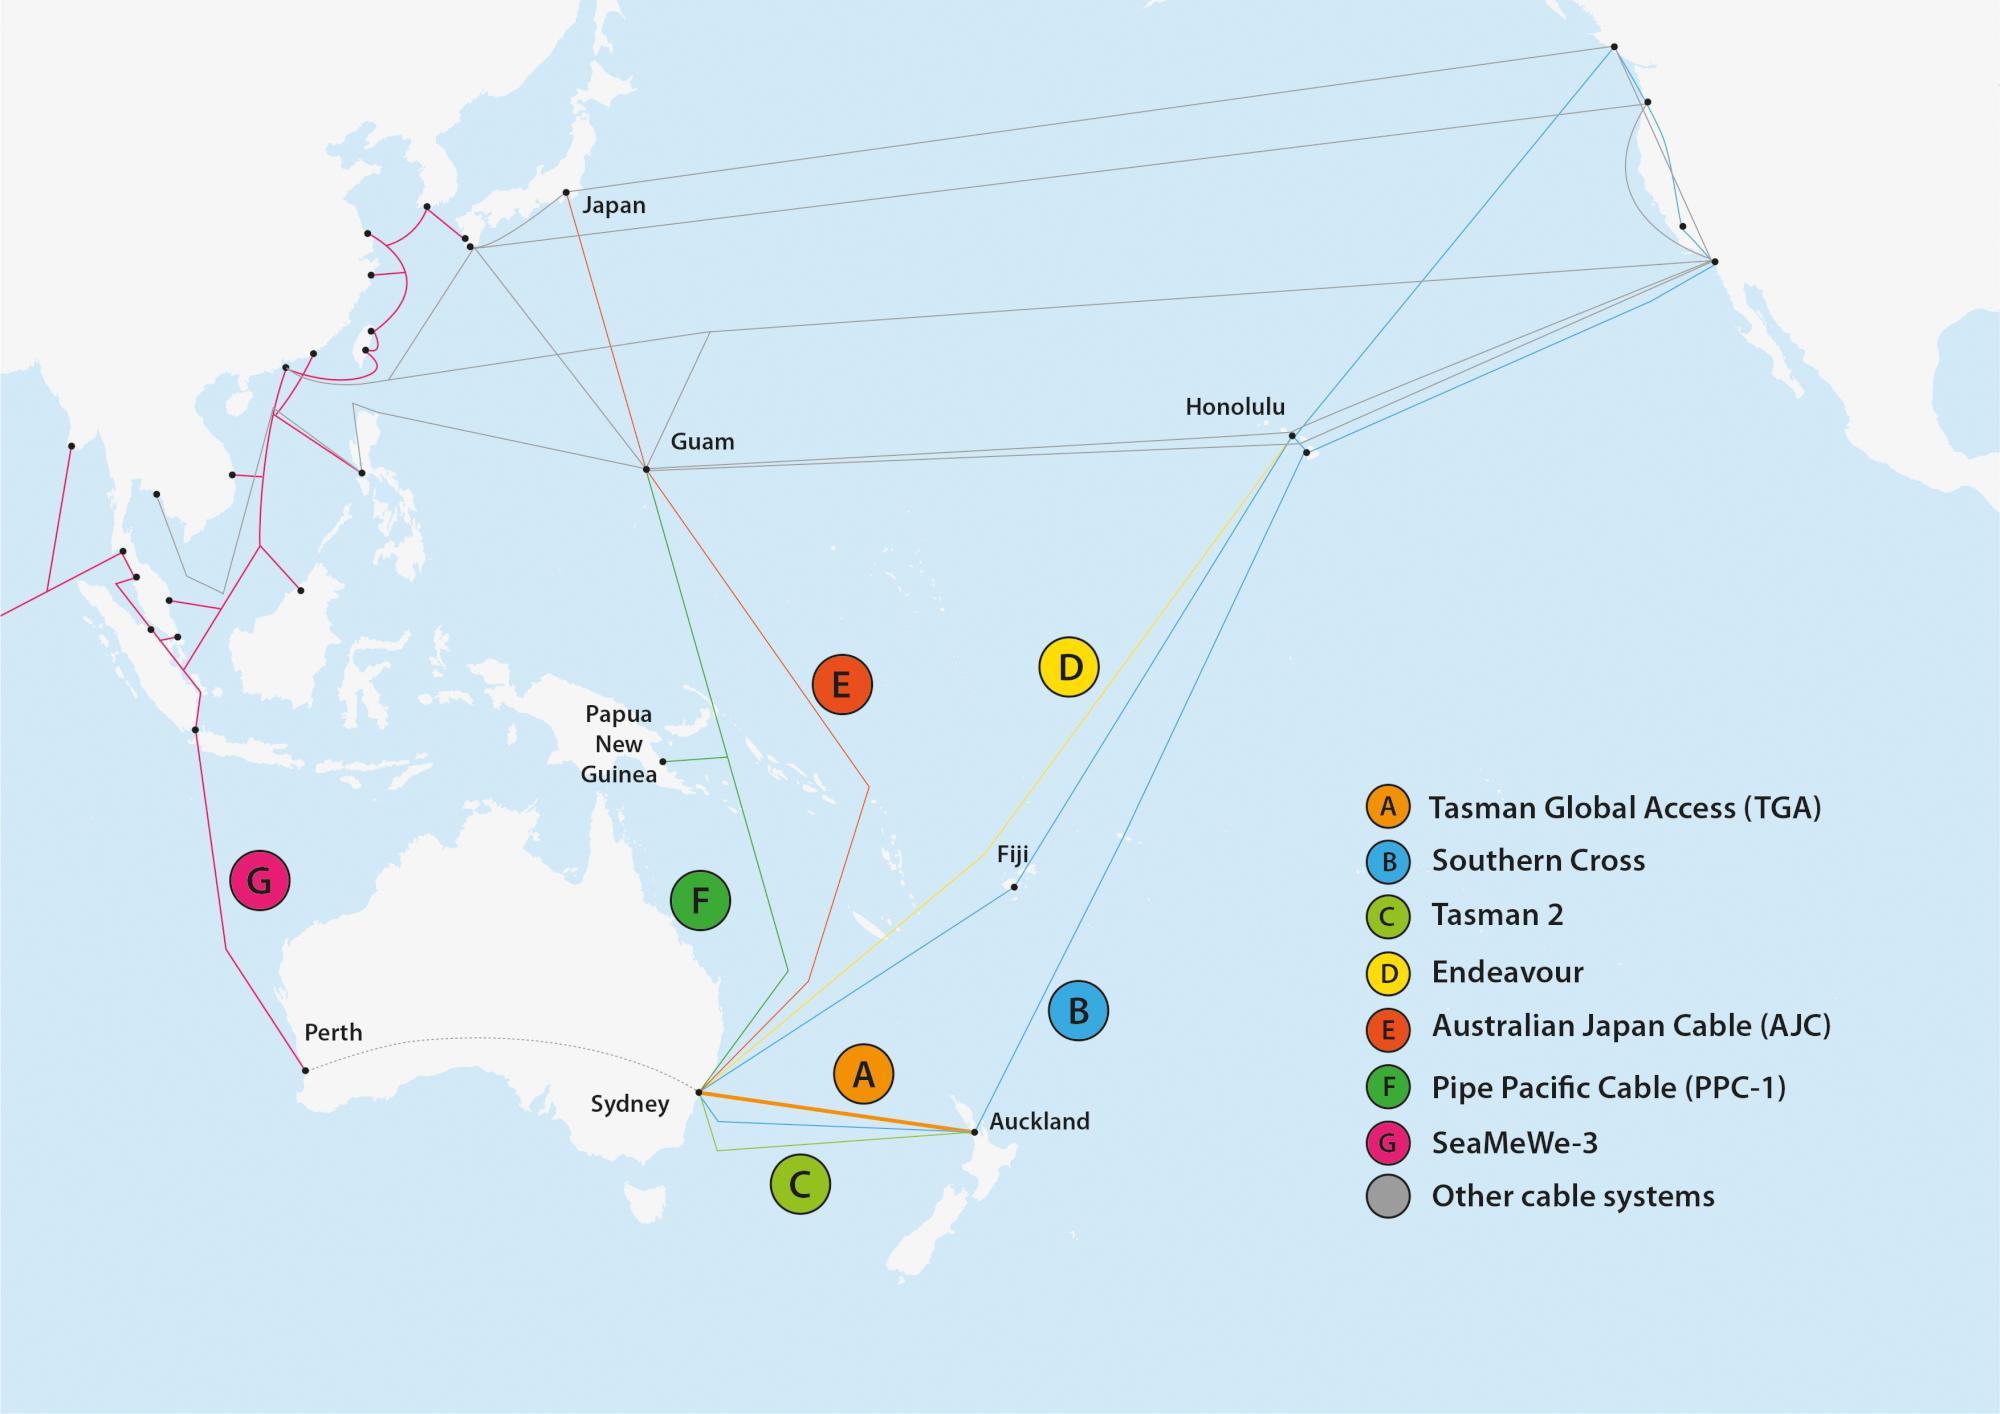 Telecom Phone Jack Wiring Diagram Nz Solutions Rj45 Vodafone Telstra Plan New Auckland Sydney Cable Scoop News